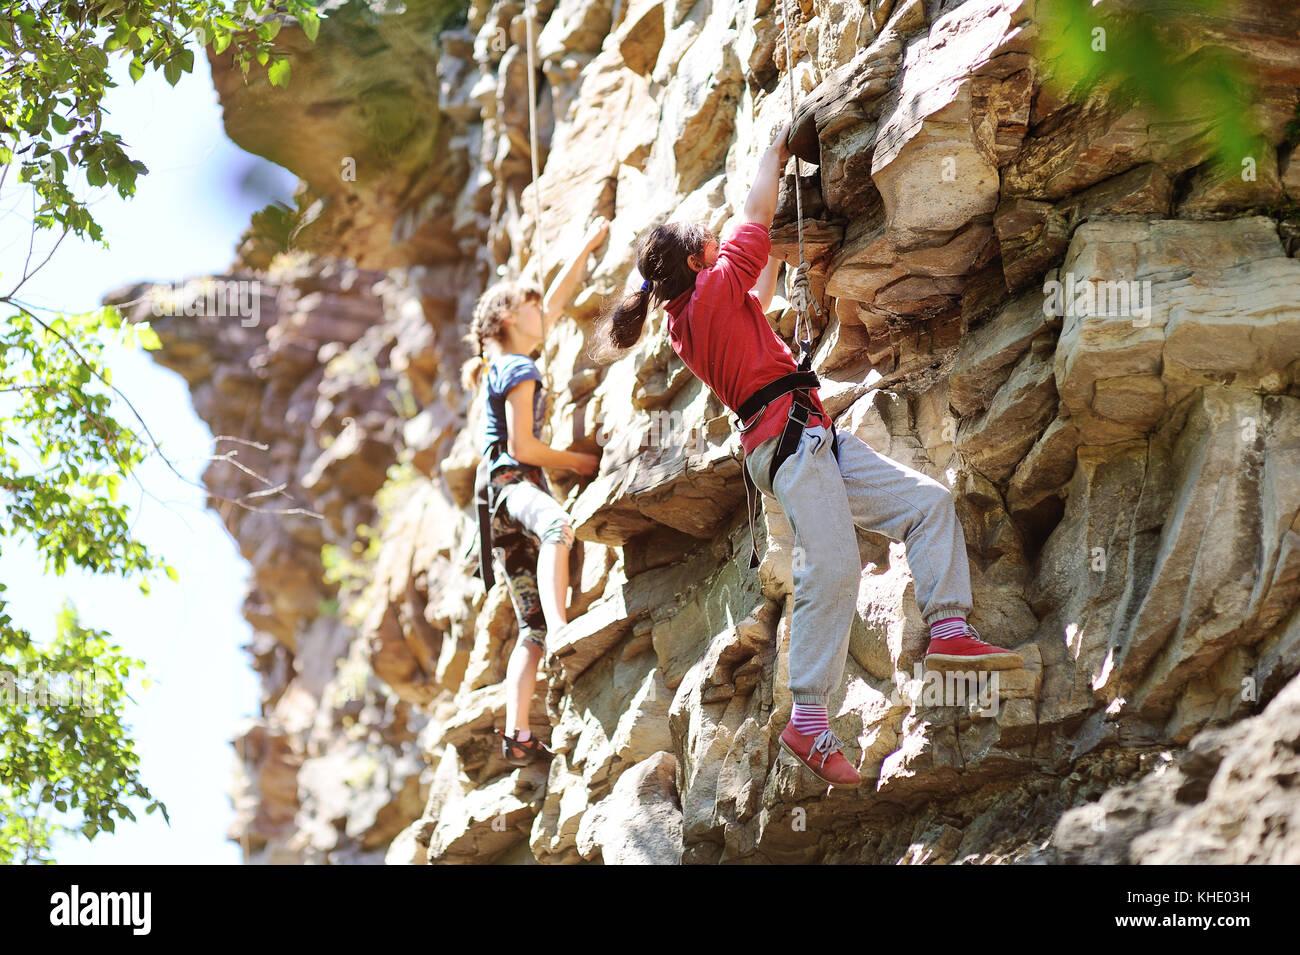 Dos chicas adolescentes participan en escalada en roca Imagen De Stock